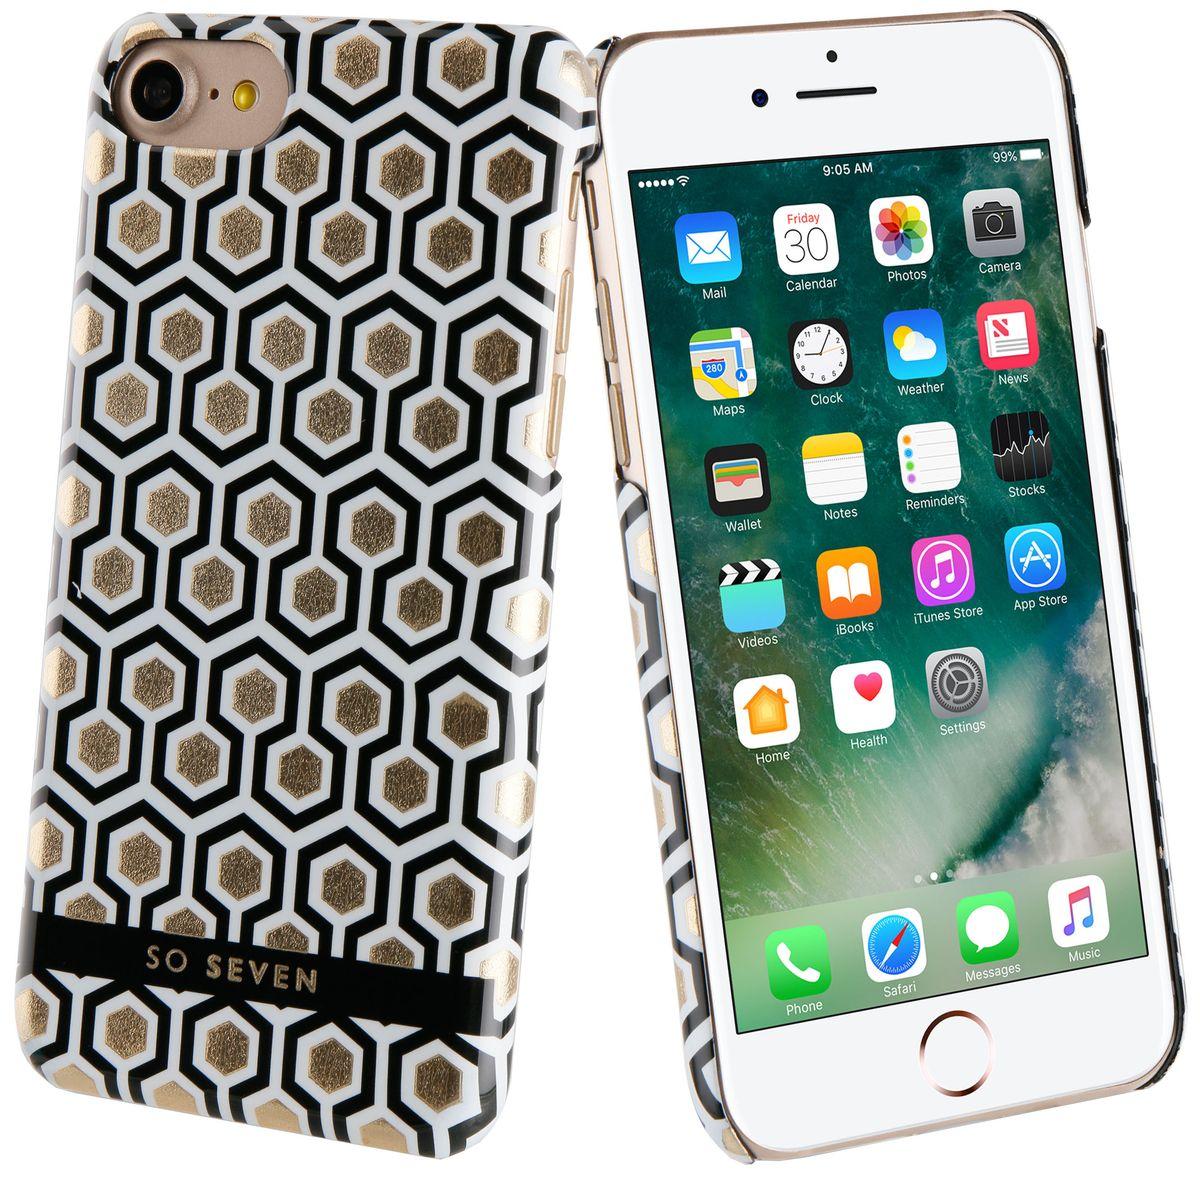 So Seven Midnight Hexagnale чехол для Apple iPhone 7/8 чехол накладка чехол накладка iphone 6 6s 4 7 lims sgp spigen стиль 1 580075